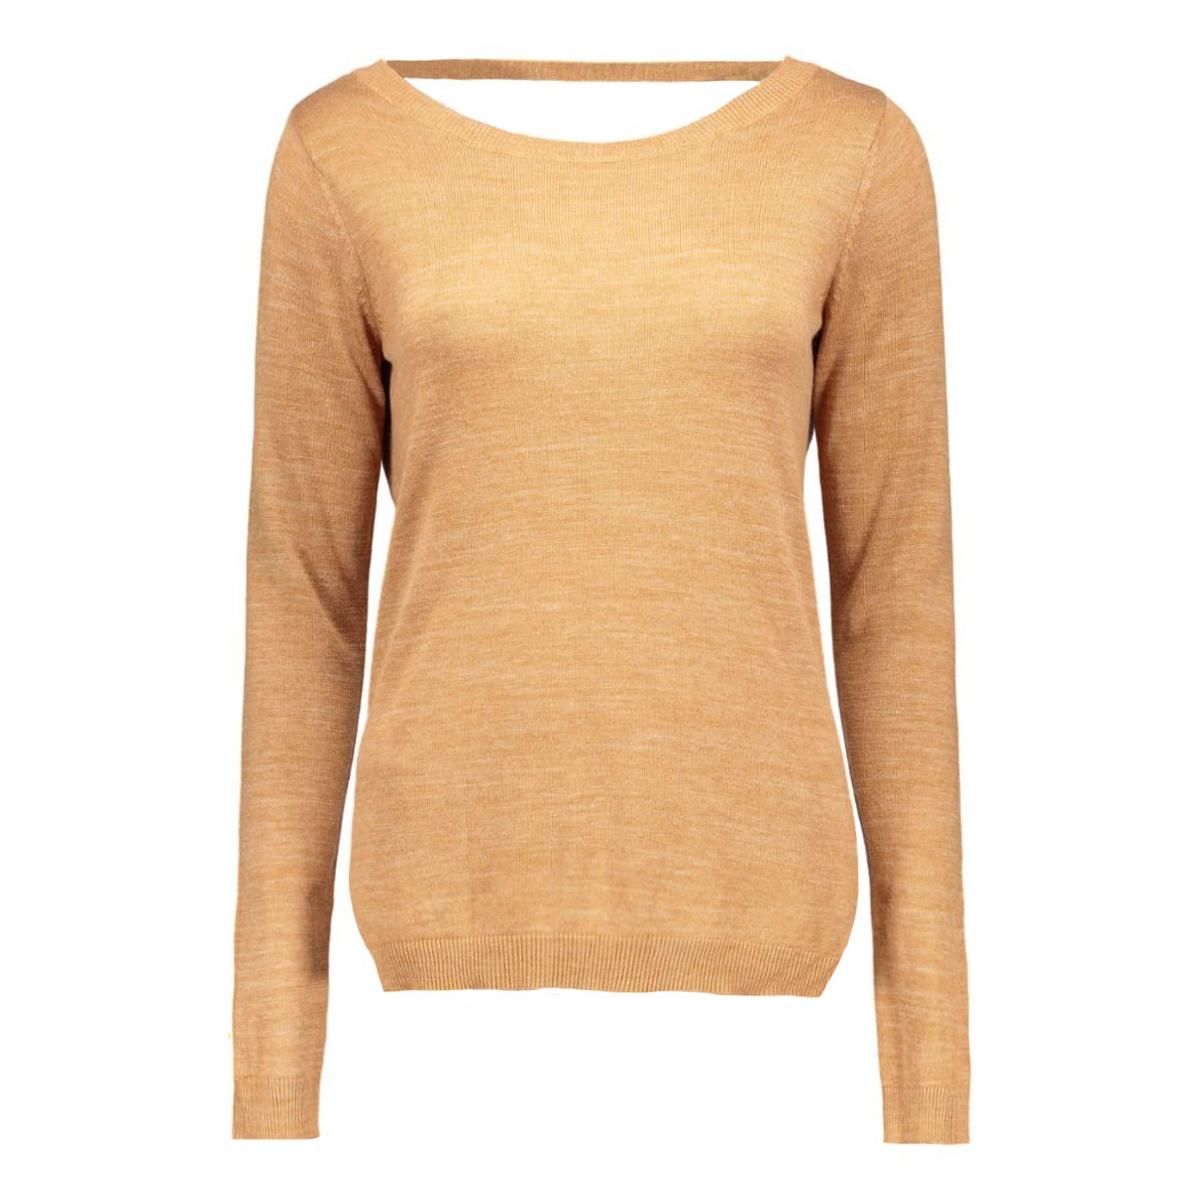 vilesly l/s knit top tb 14035529 vila trui wood thrush